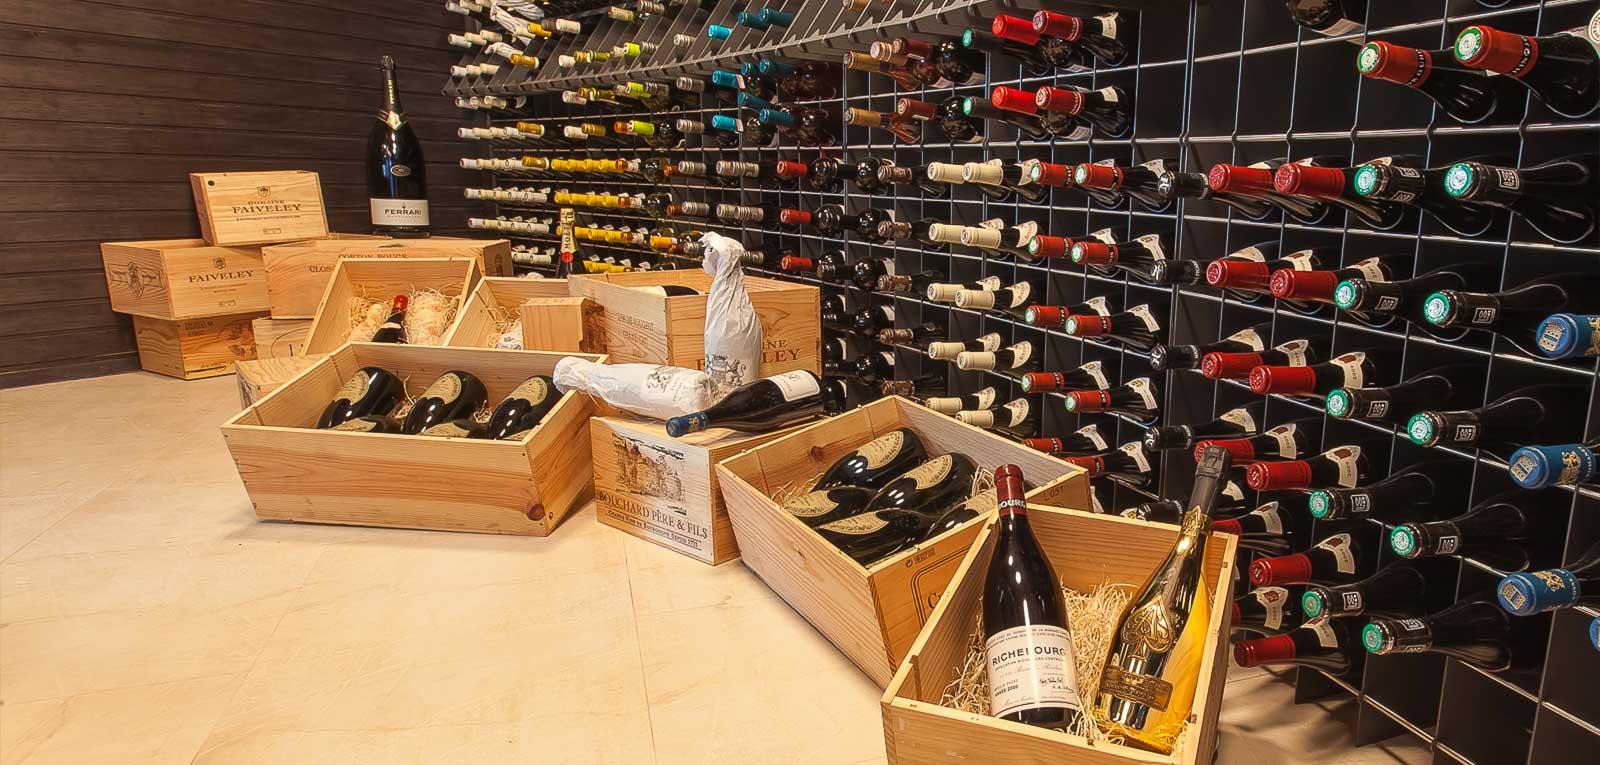 Wine Cellar Pictures Kuredu Wine Cellar Maldives Wine Cellar